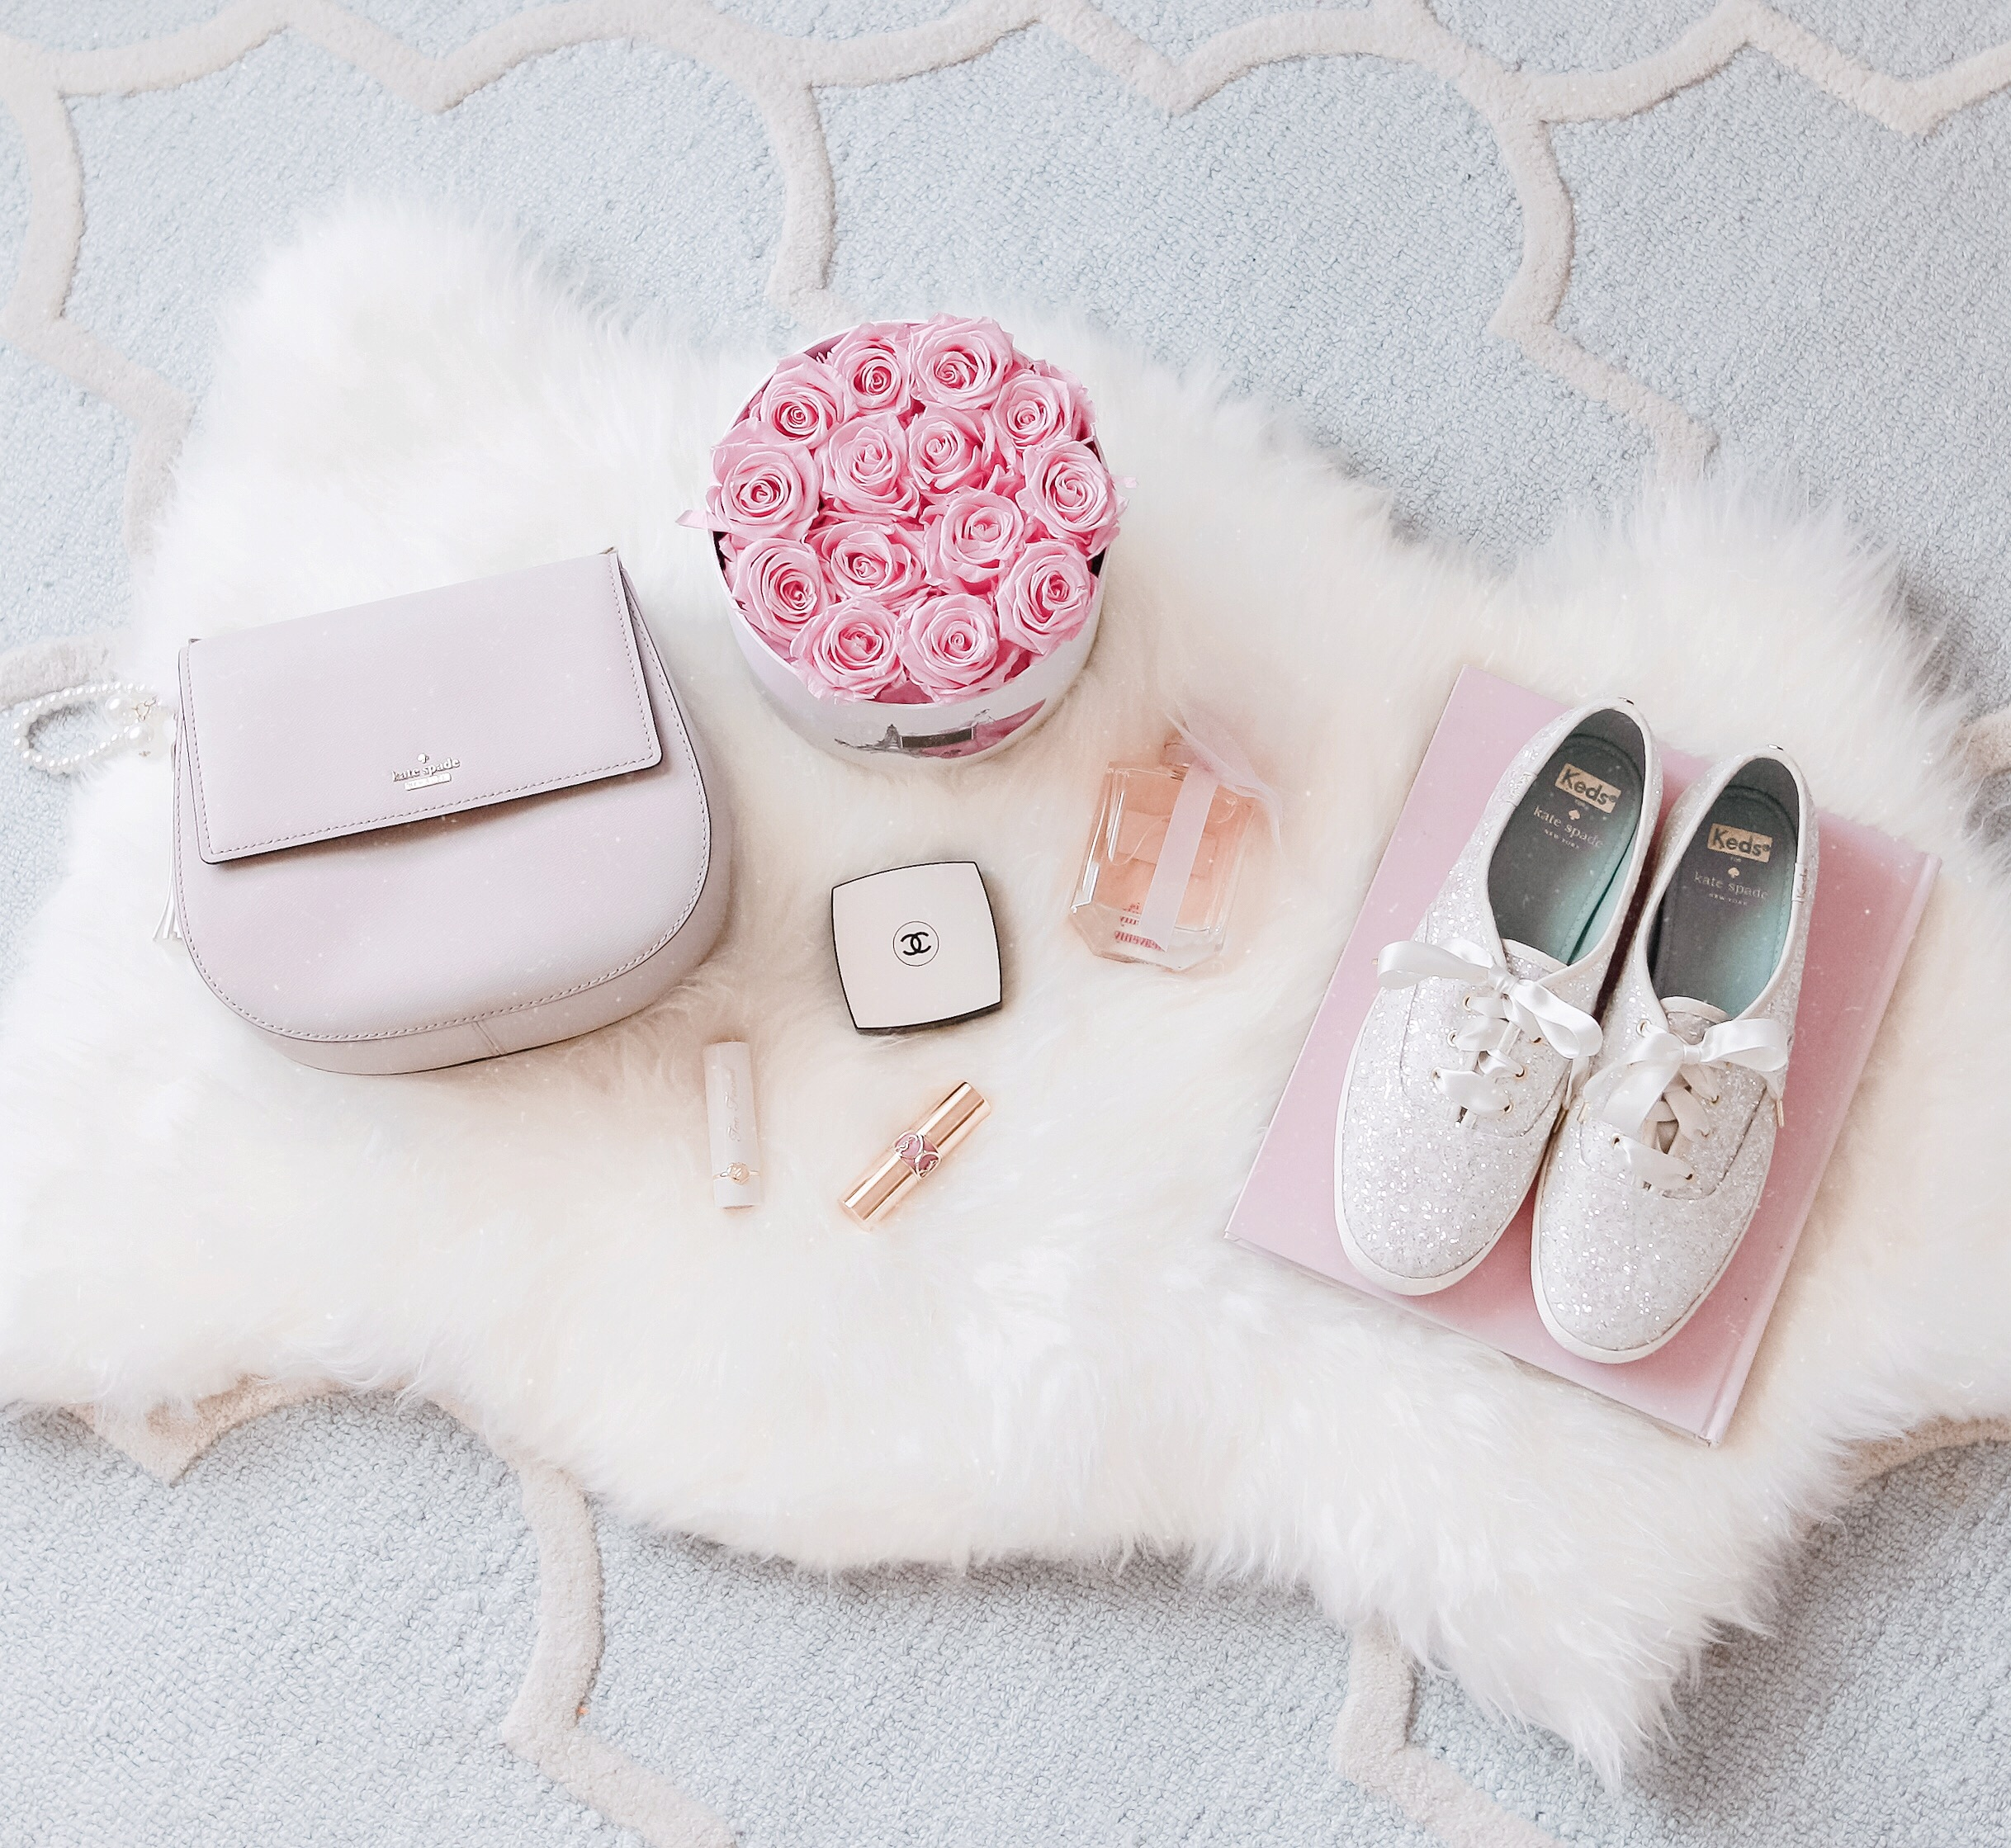 Handbags For Spring That Are Oh So Feminine & Cute